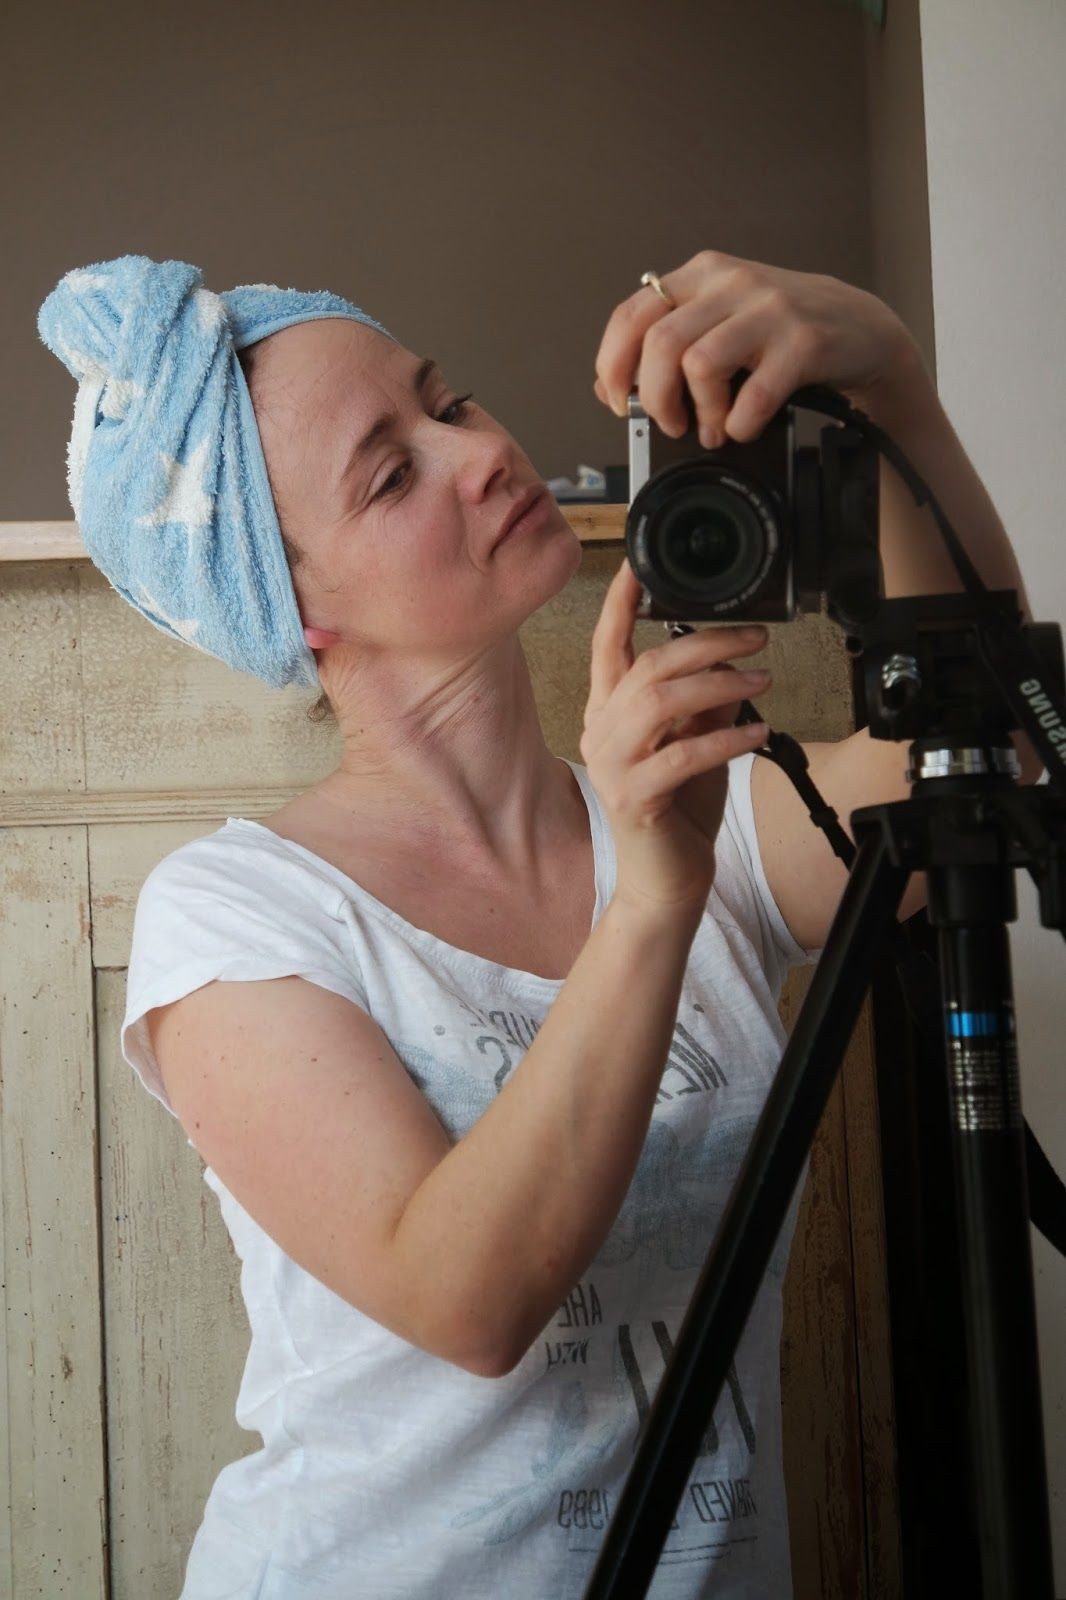 haarturban schnittmuster hair turban pattern free. Black Bedroom Furniture Sets. Home Design Ideas